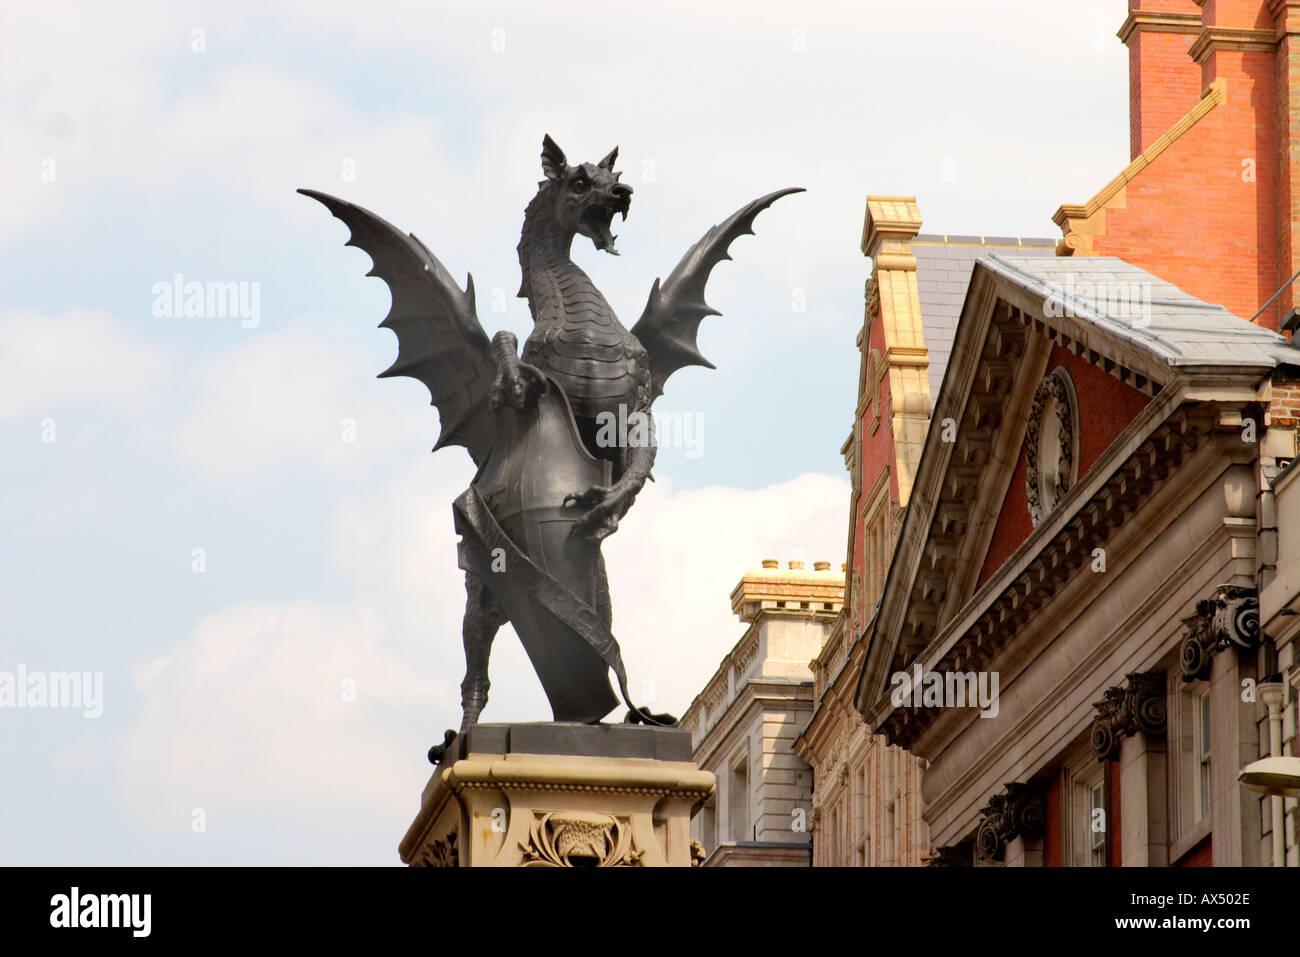 bronze Dragon statue  London uk - Stock Image